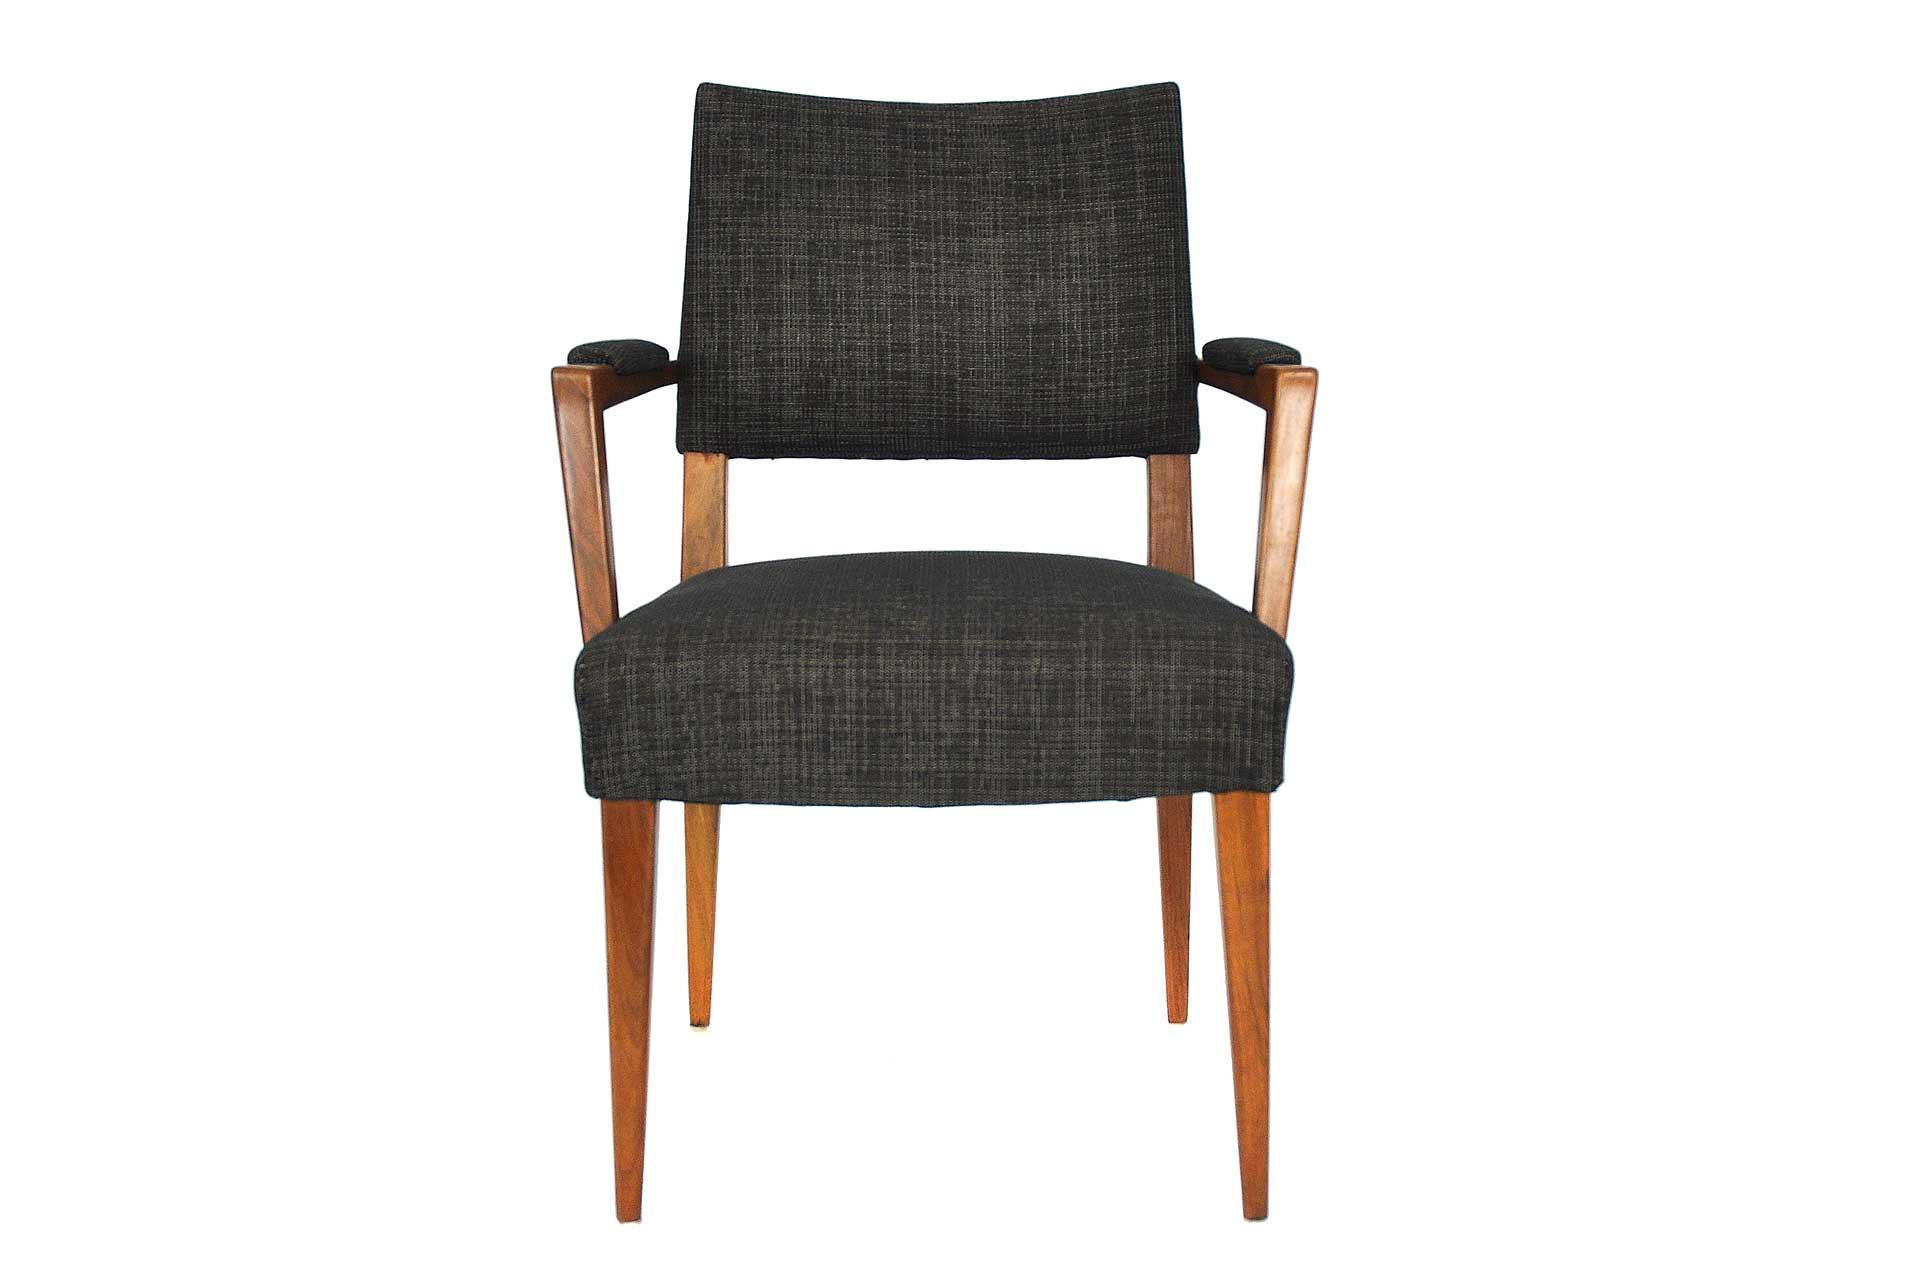 Lichterloh stuhl erich boltenstern for Stuhl design 20 jahrhundert